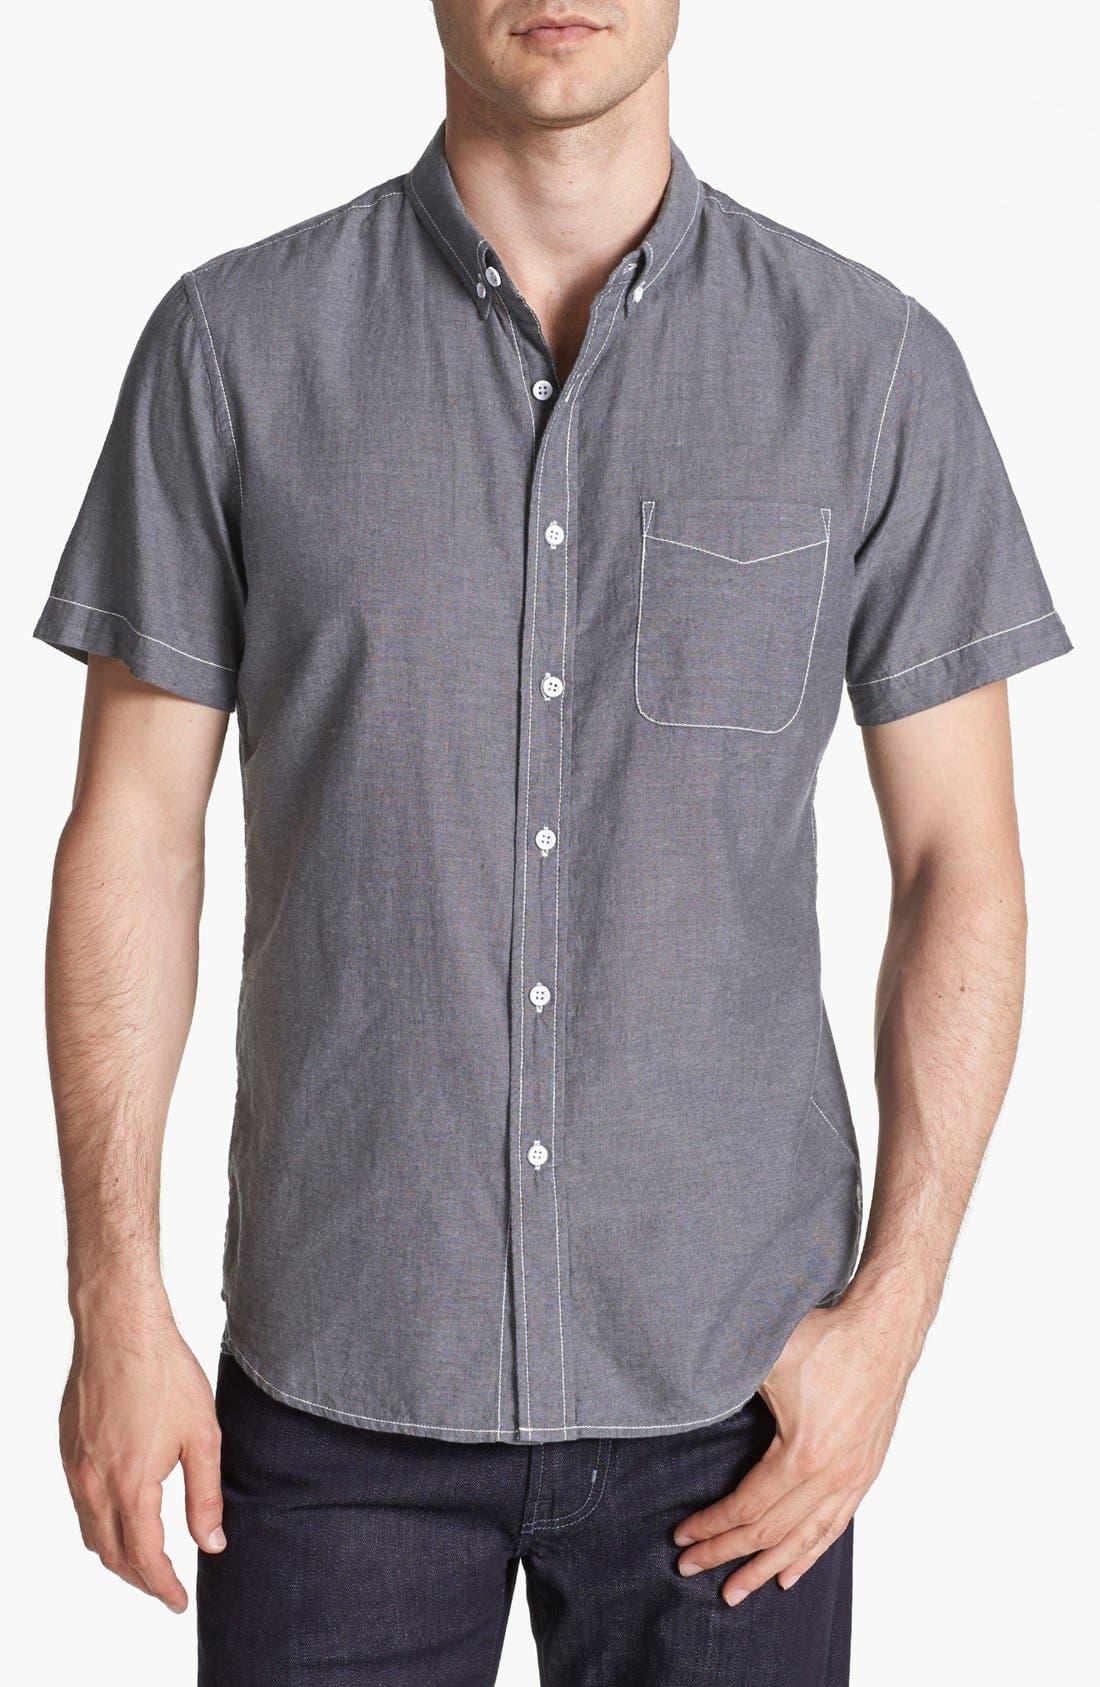 Alternate Image 1 Selected - AG Short Sleeve Chambray Sport Shirt